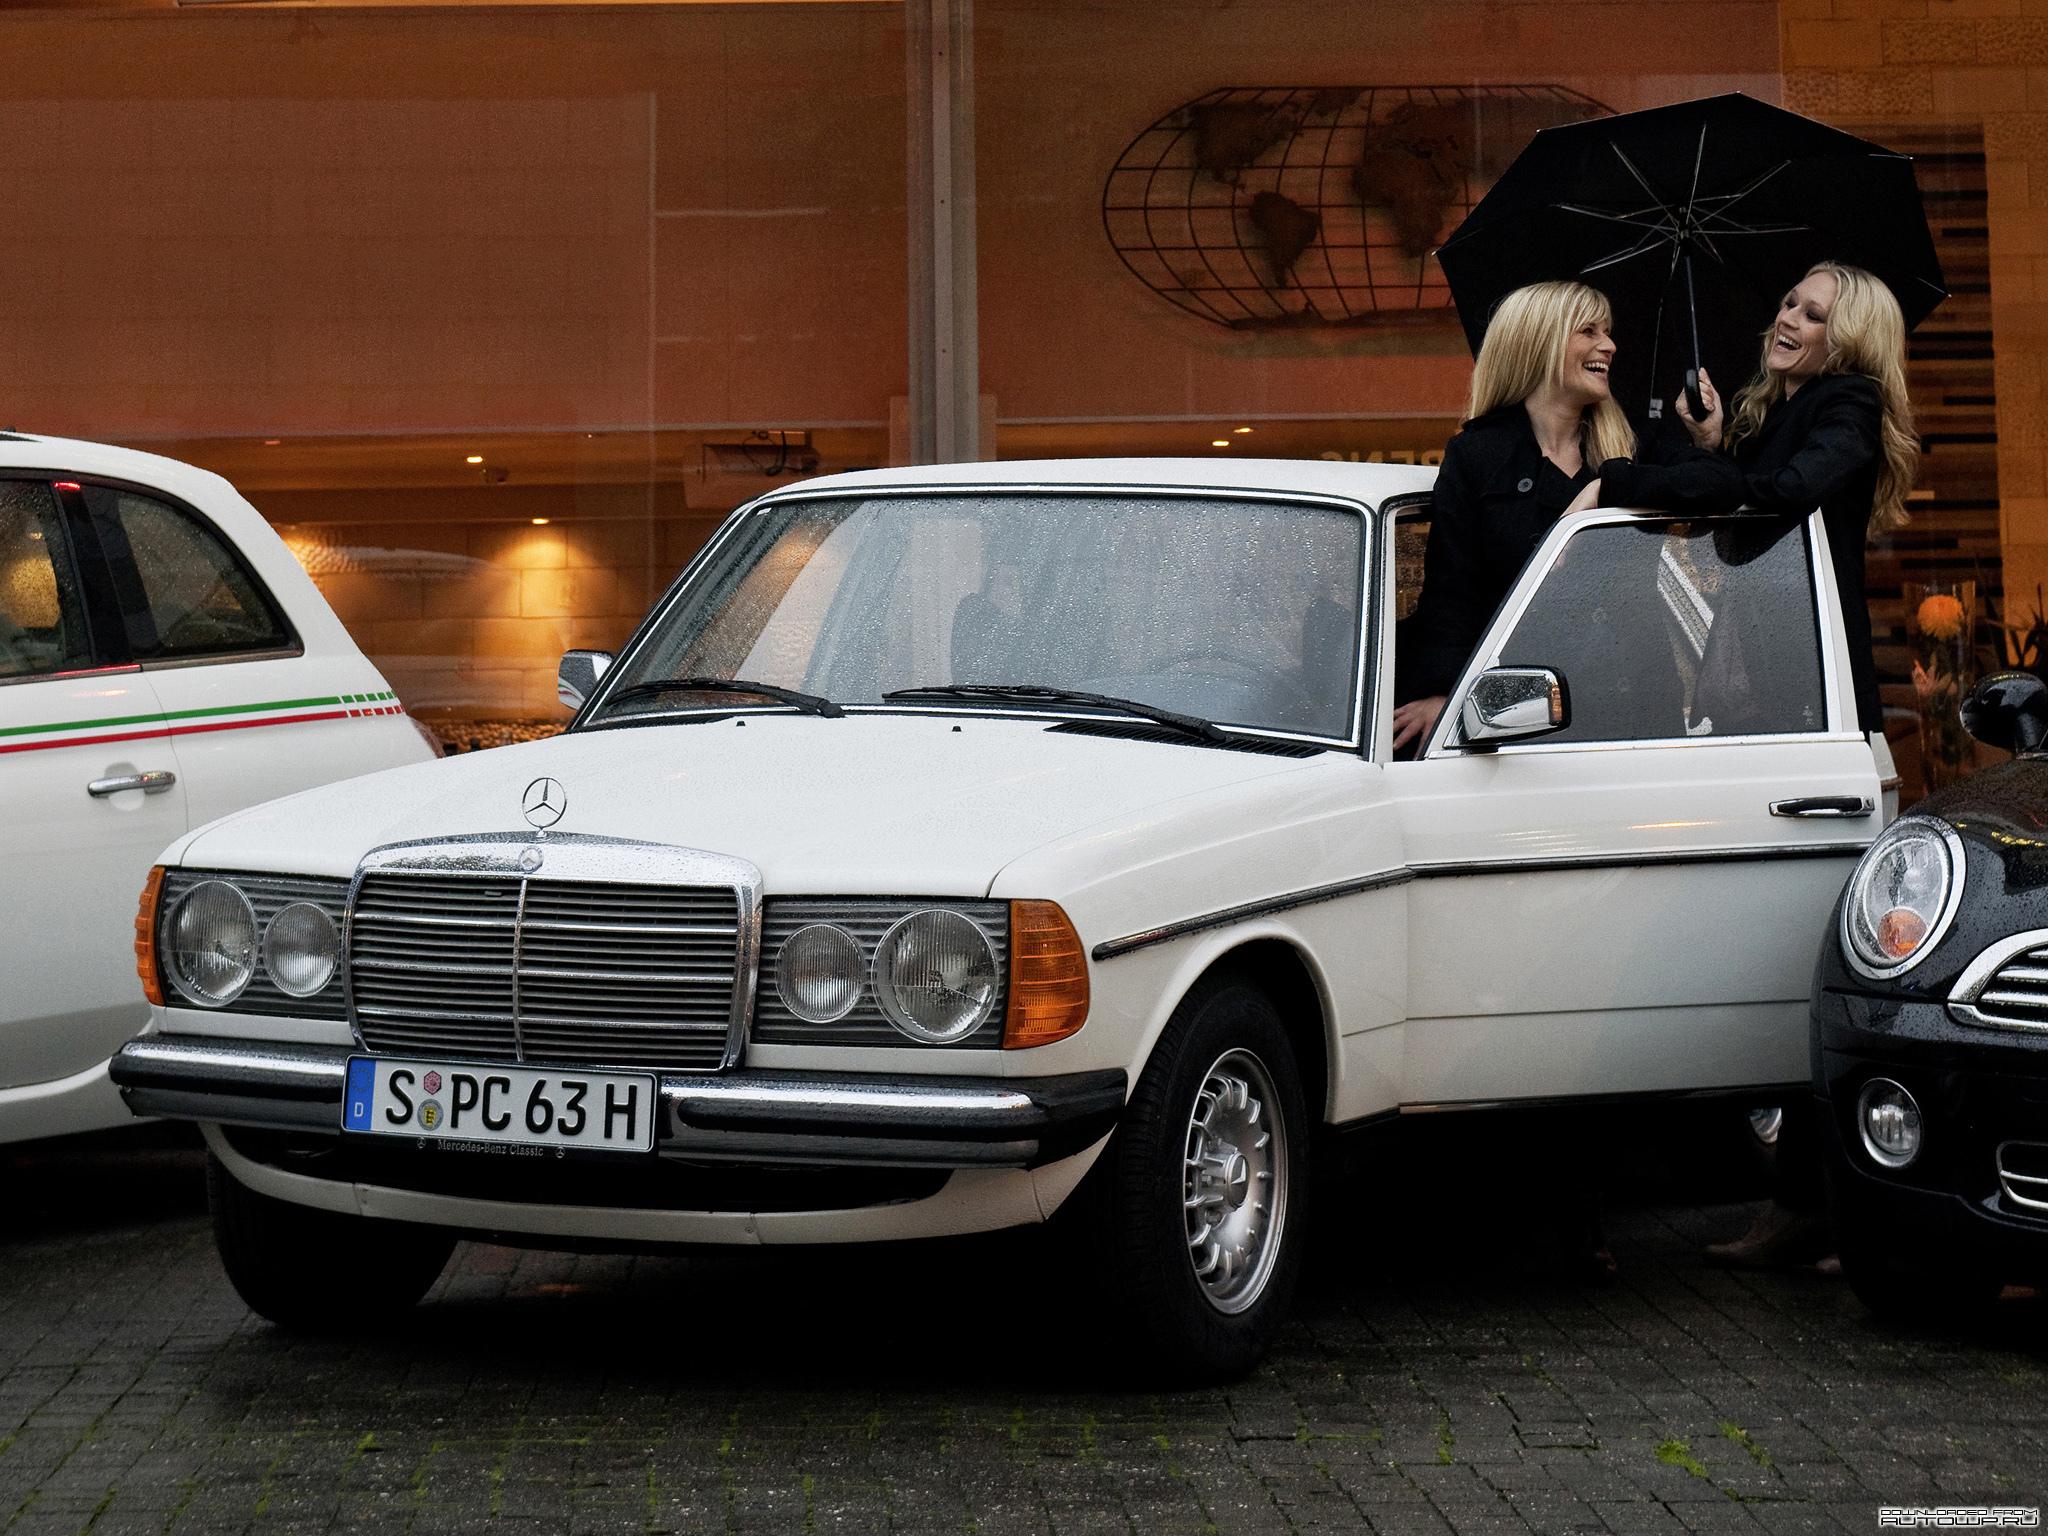 Mercedes benz e class w123 picture 76627 mercedes benz for Mercedes benz w123